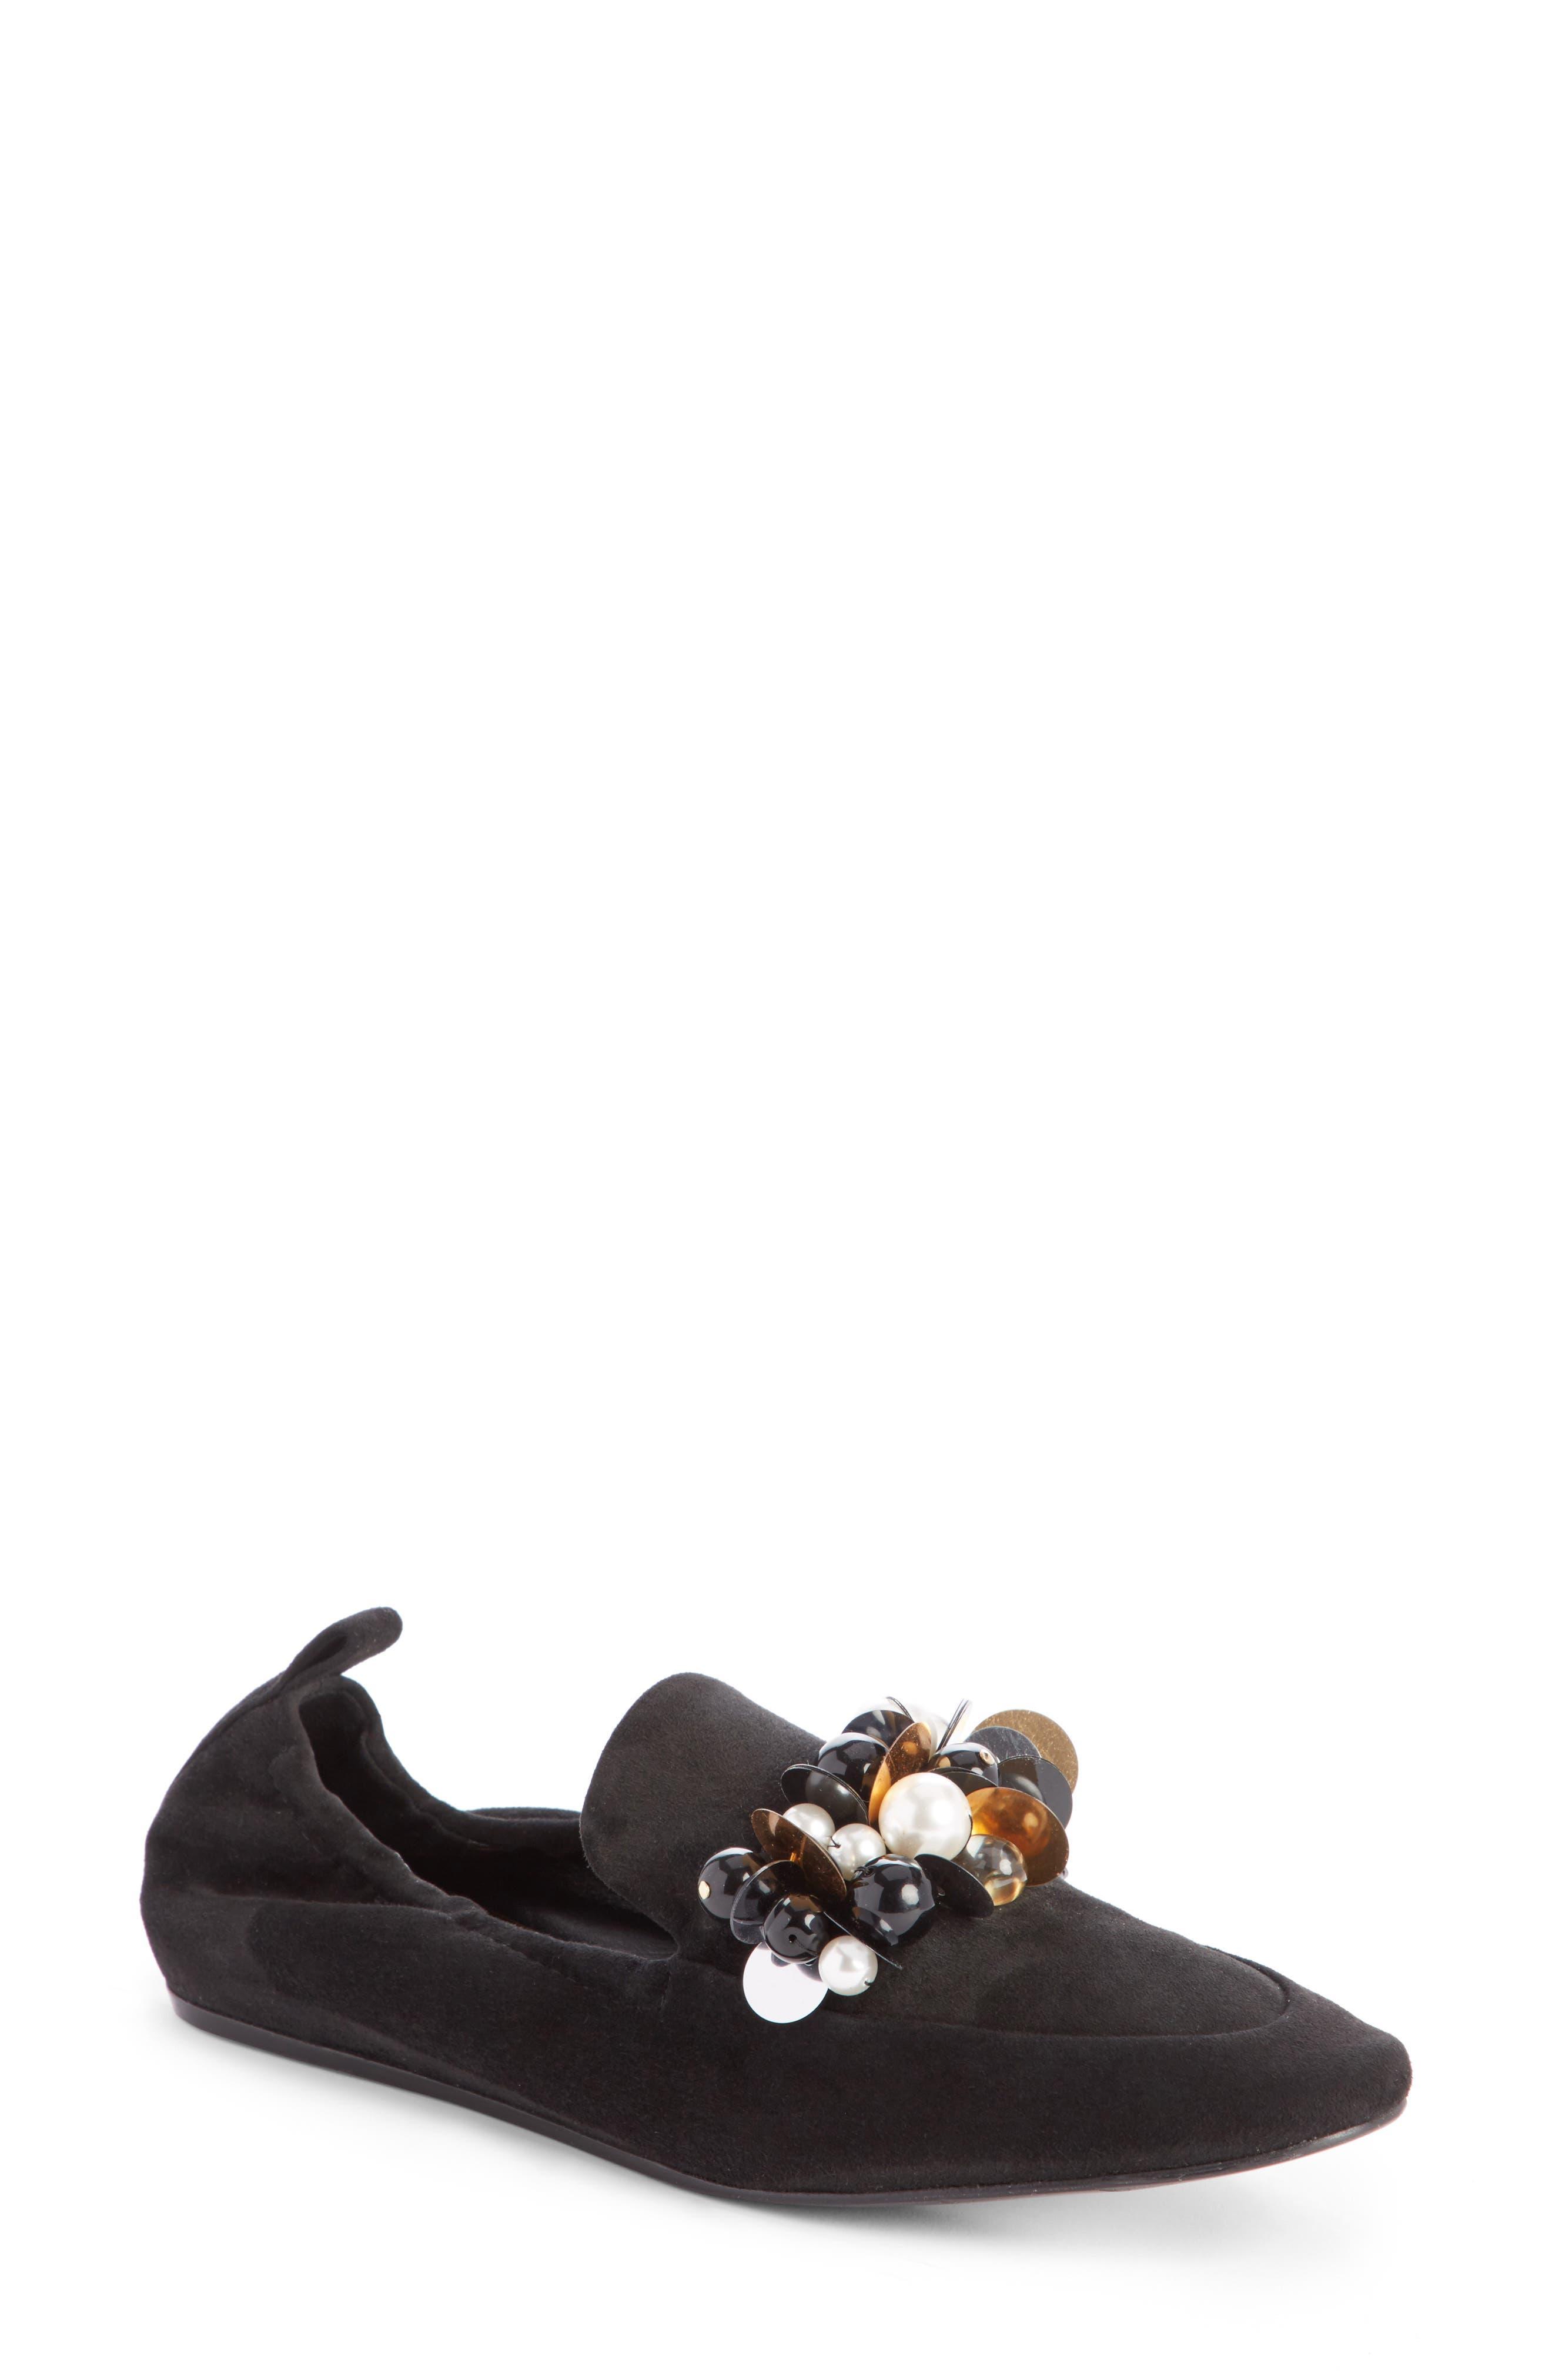 Pearl Slipper Loafer,                         Main,                         color, 001